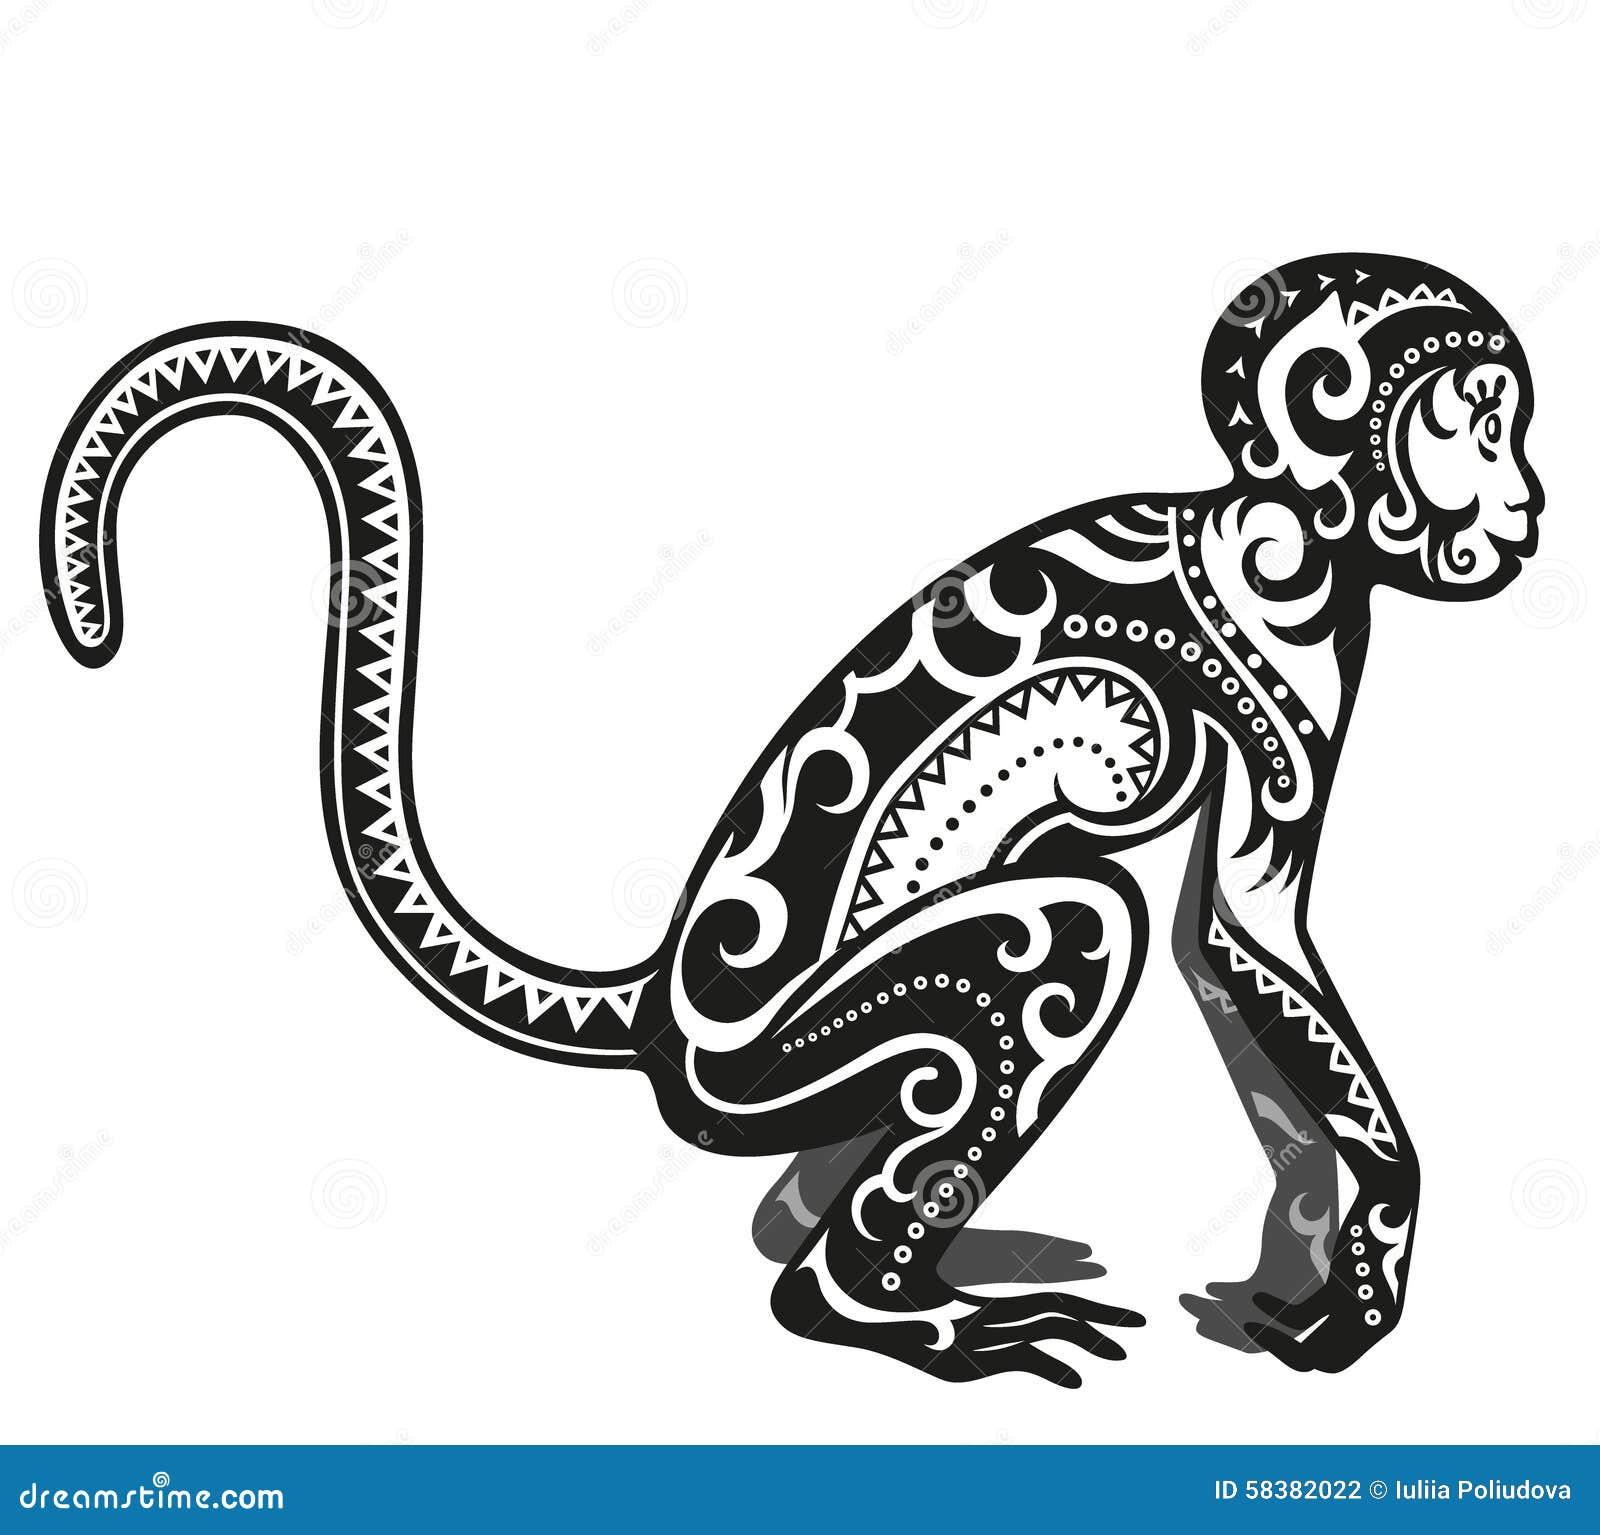 ethnic ornamented monkey stock illustration